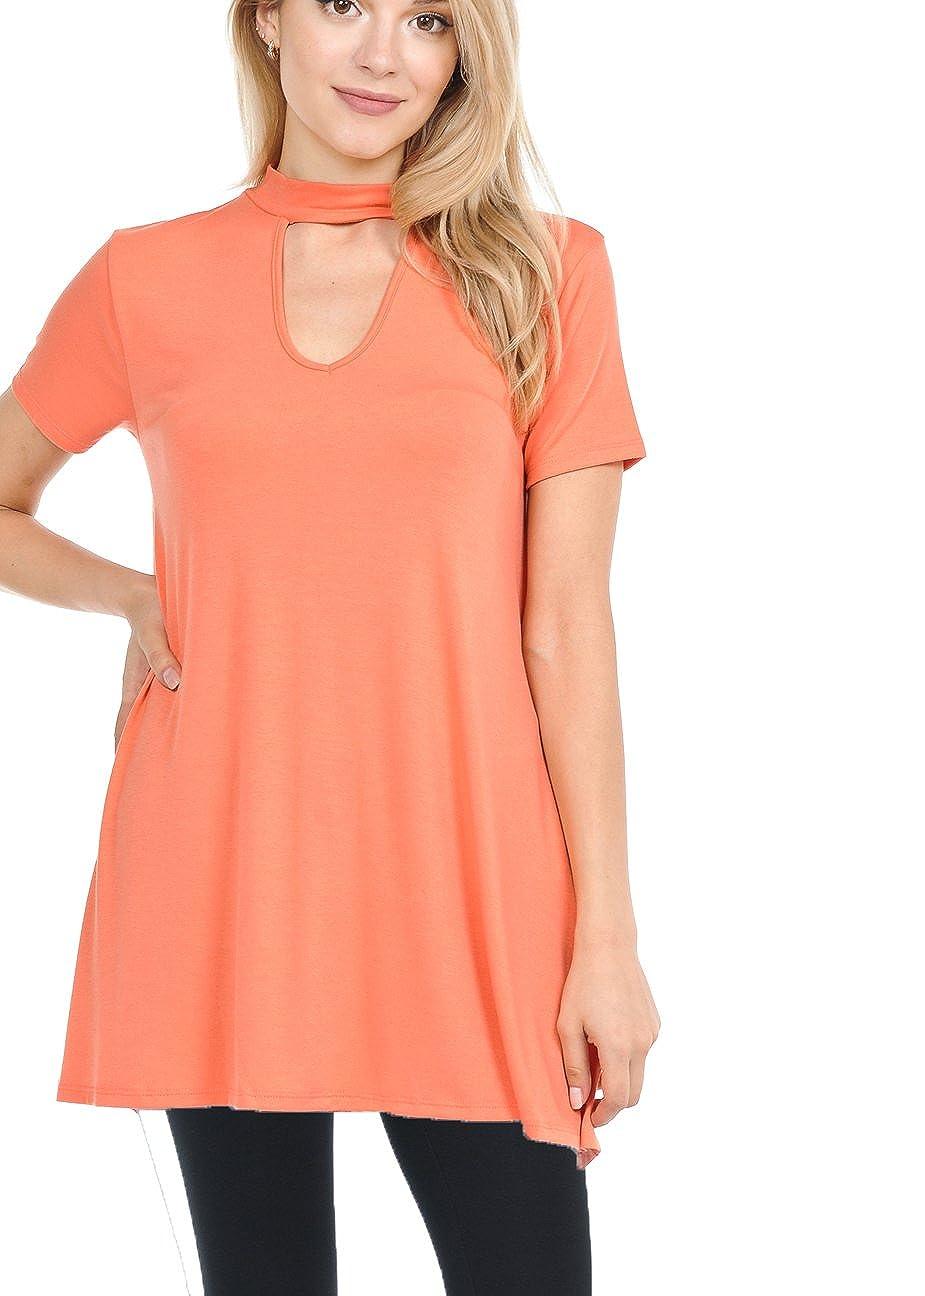 Deep Coral JNTOP Women's Premium Short Sleeve Choker Neck Tunic Top